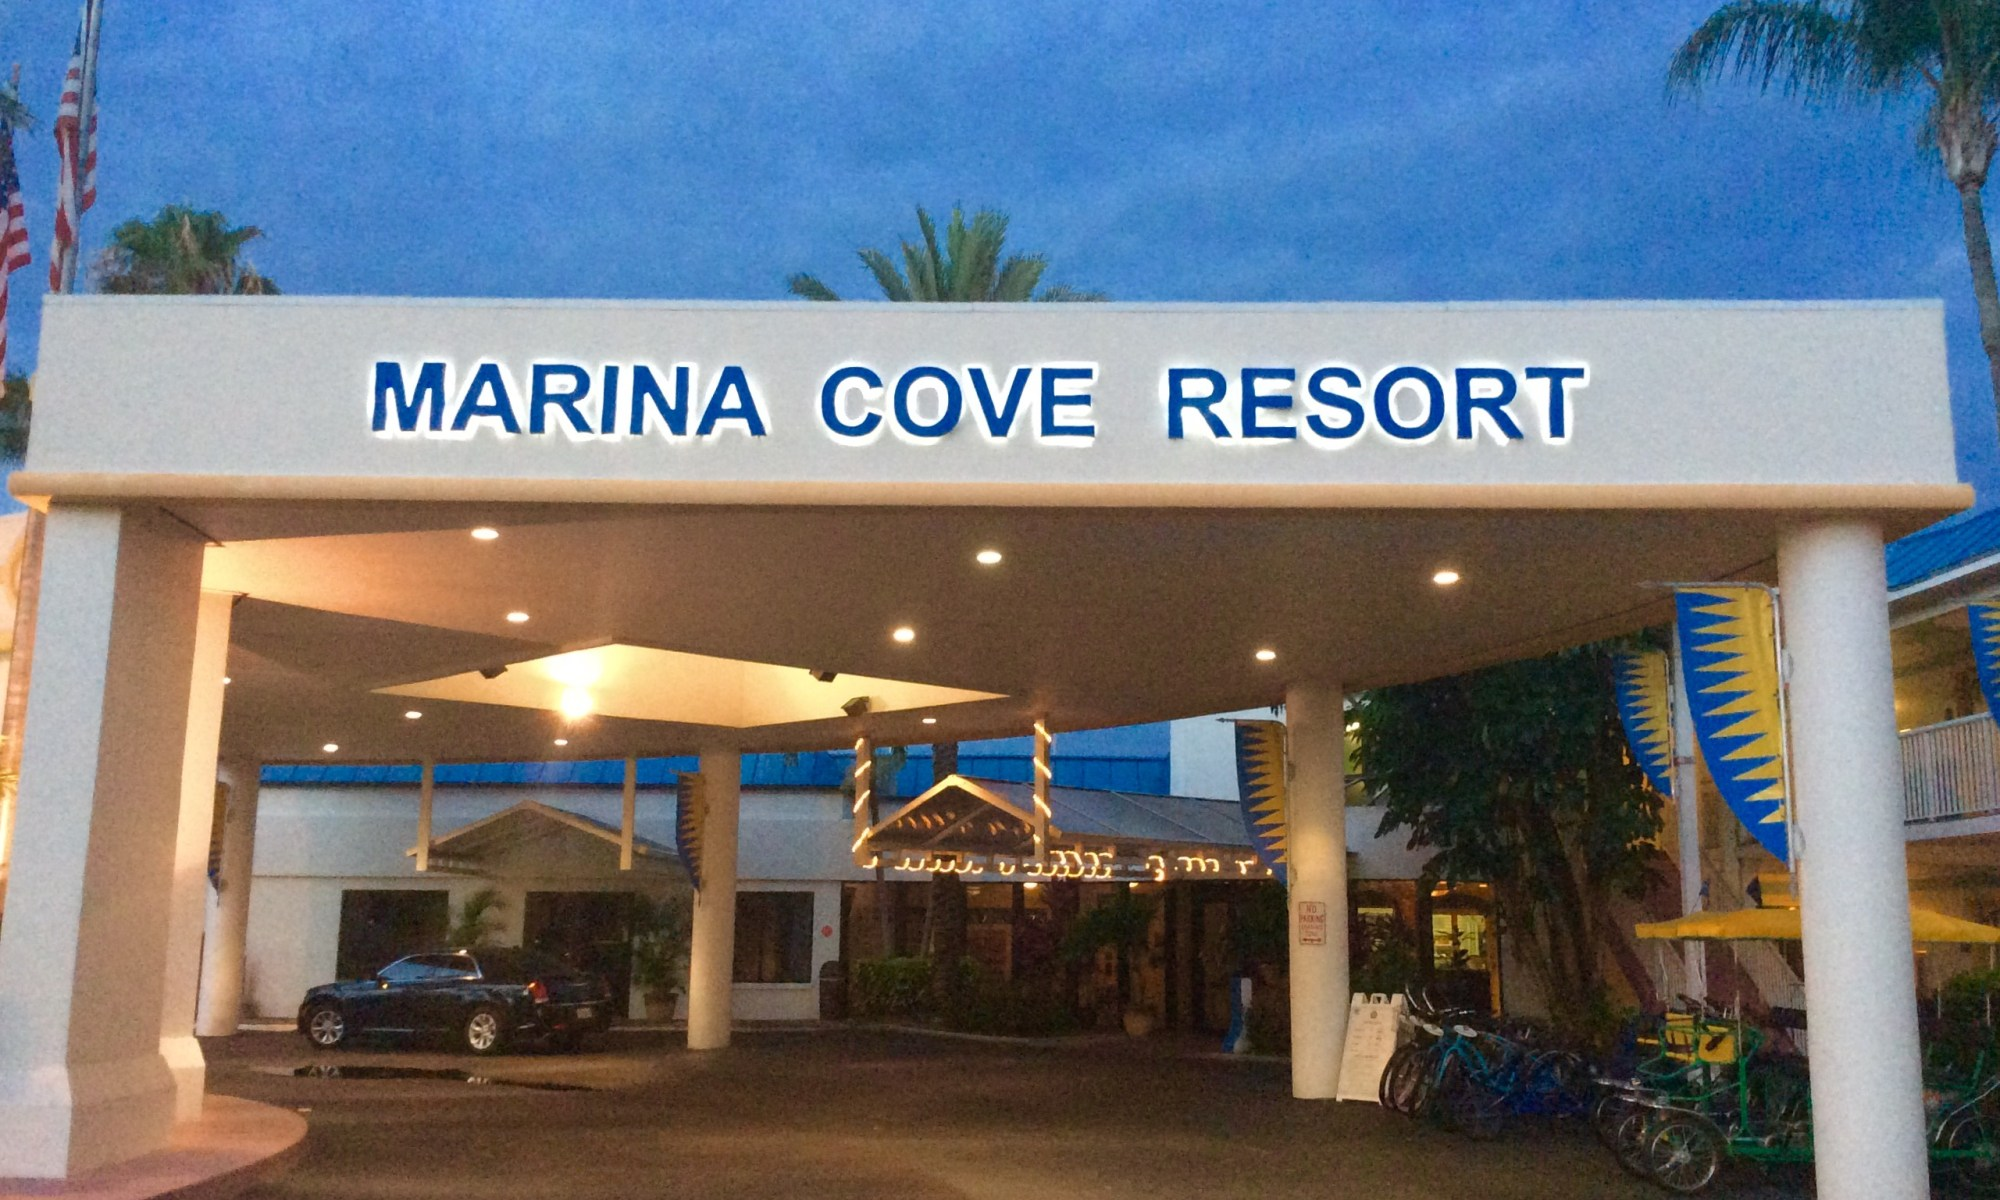 Marina Cove Resort St. Petersburg, FL with Potencial Millonario con Felix A. Montelara